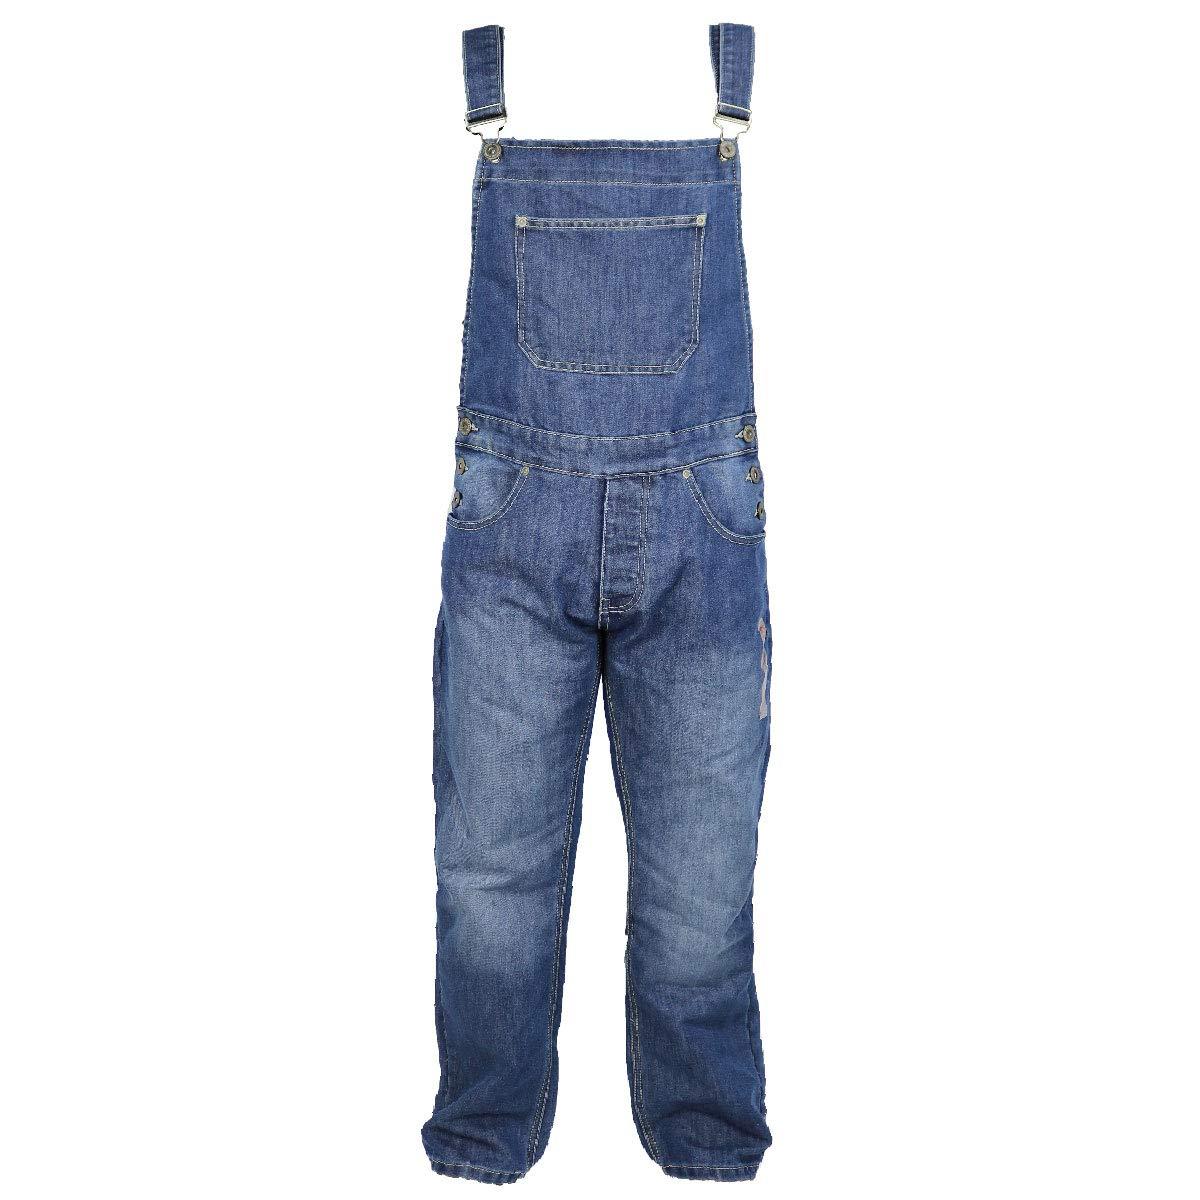 VON DENIM Mens Denim Cotton Dungarees with Button Fly and Bib Pocket Stylish Overalls Fashion Work Boiler Suit Blue Black